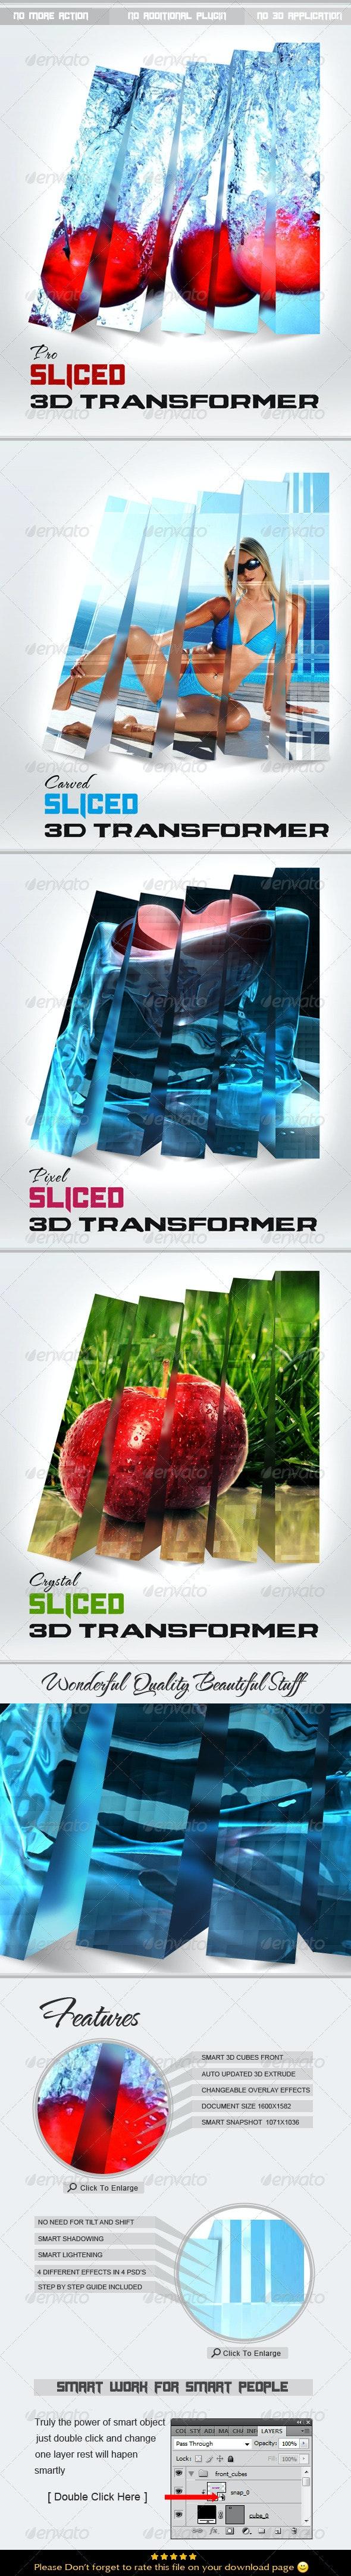 Sliced 3D Transformer - Tech / Futuristic Photo Templates